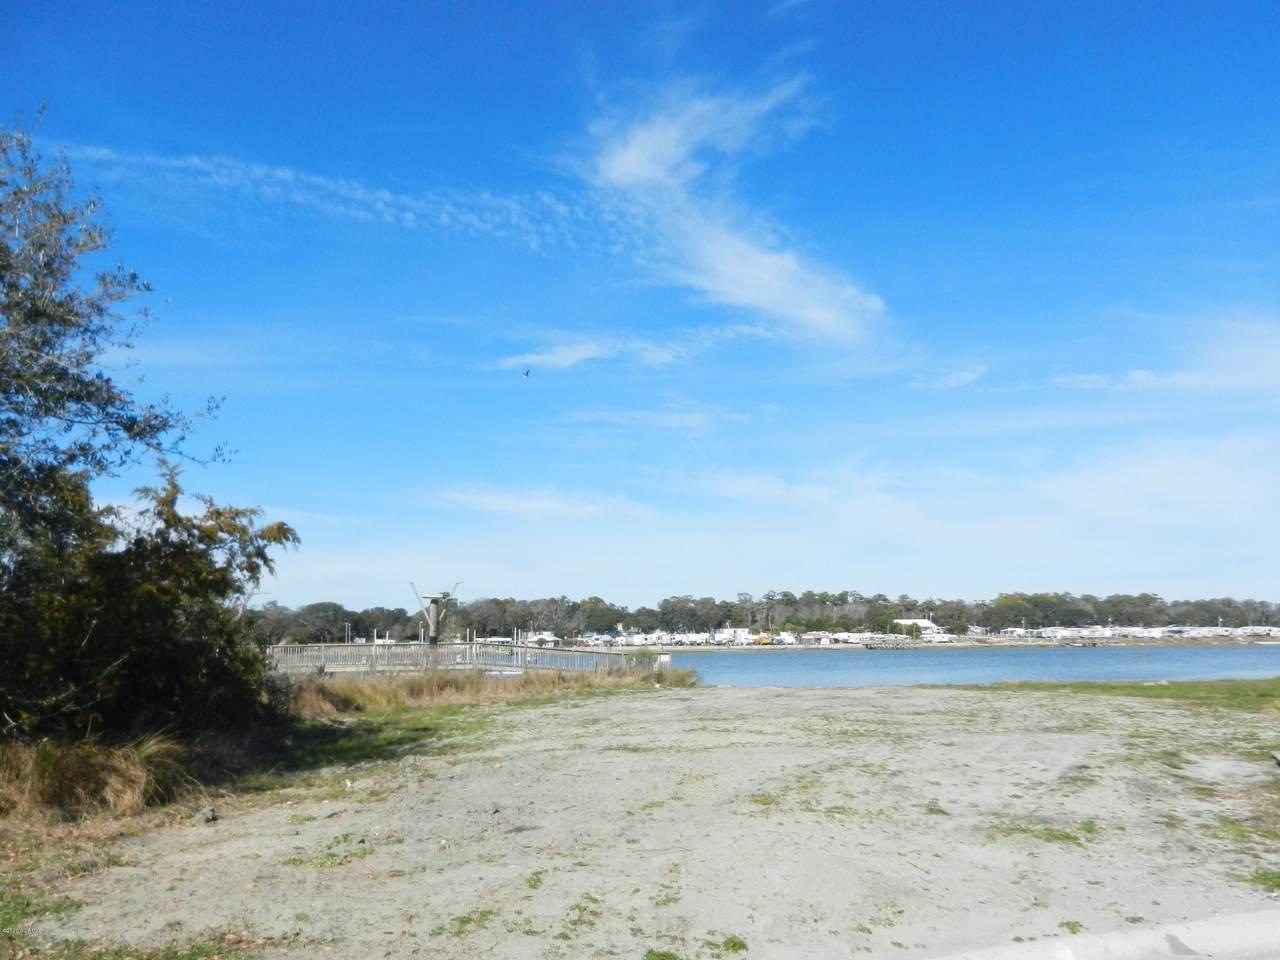 18 Baywatch Drive - Photo 1